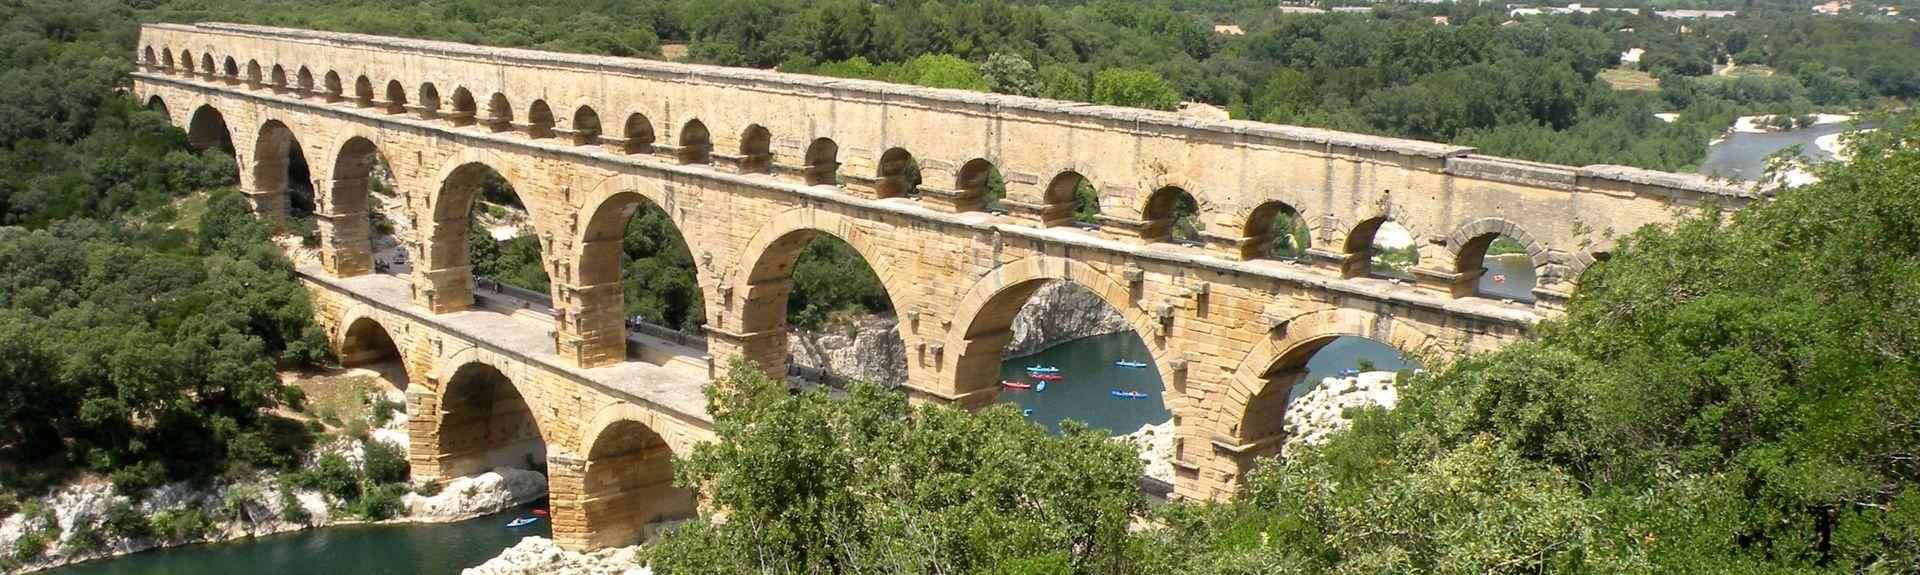 Dions, Gard, France